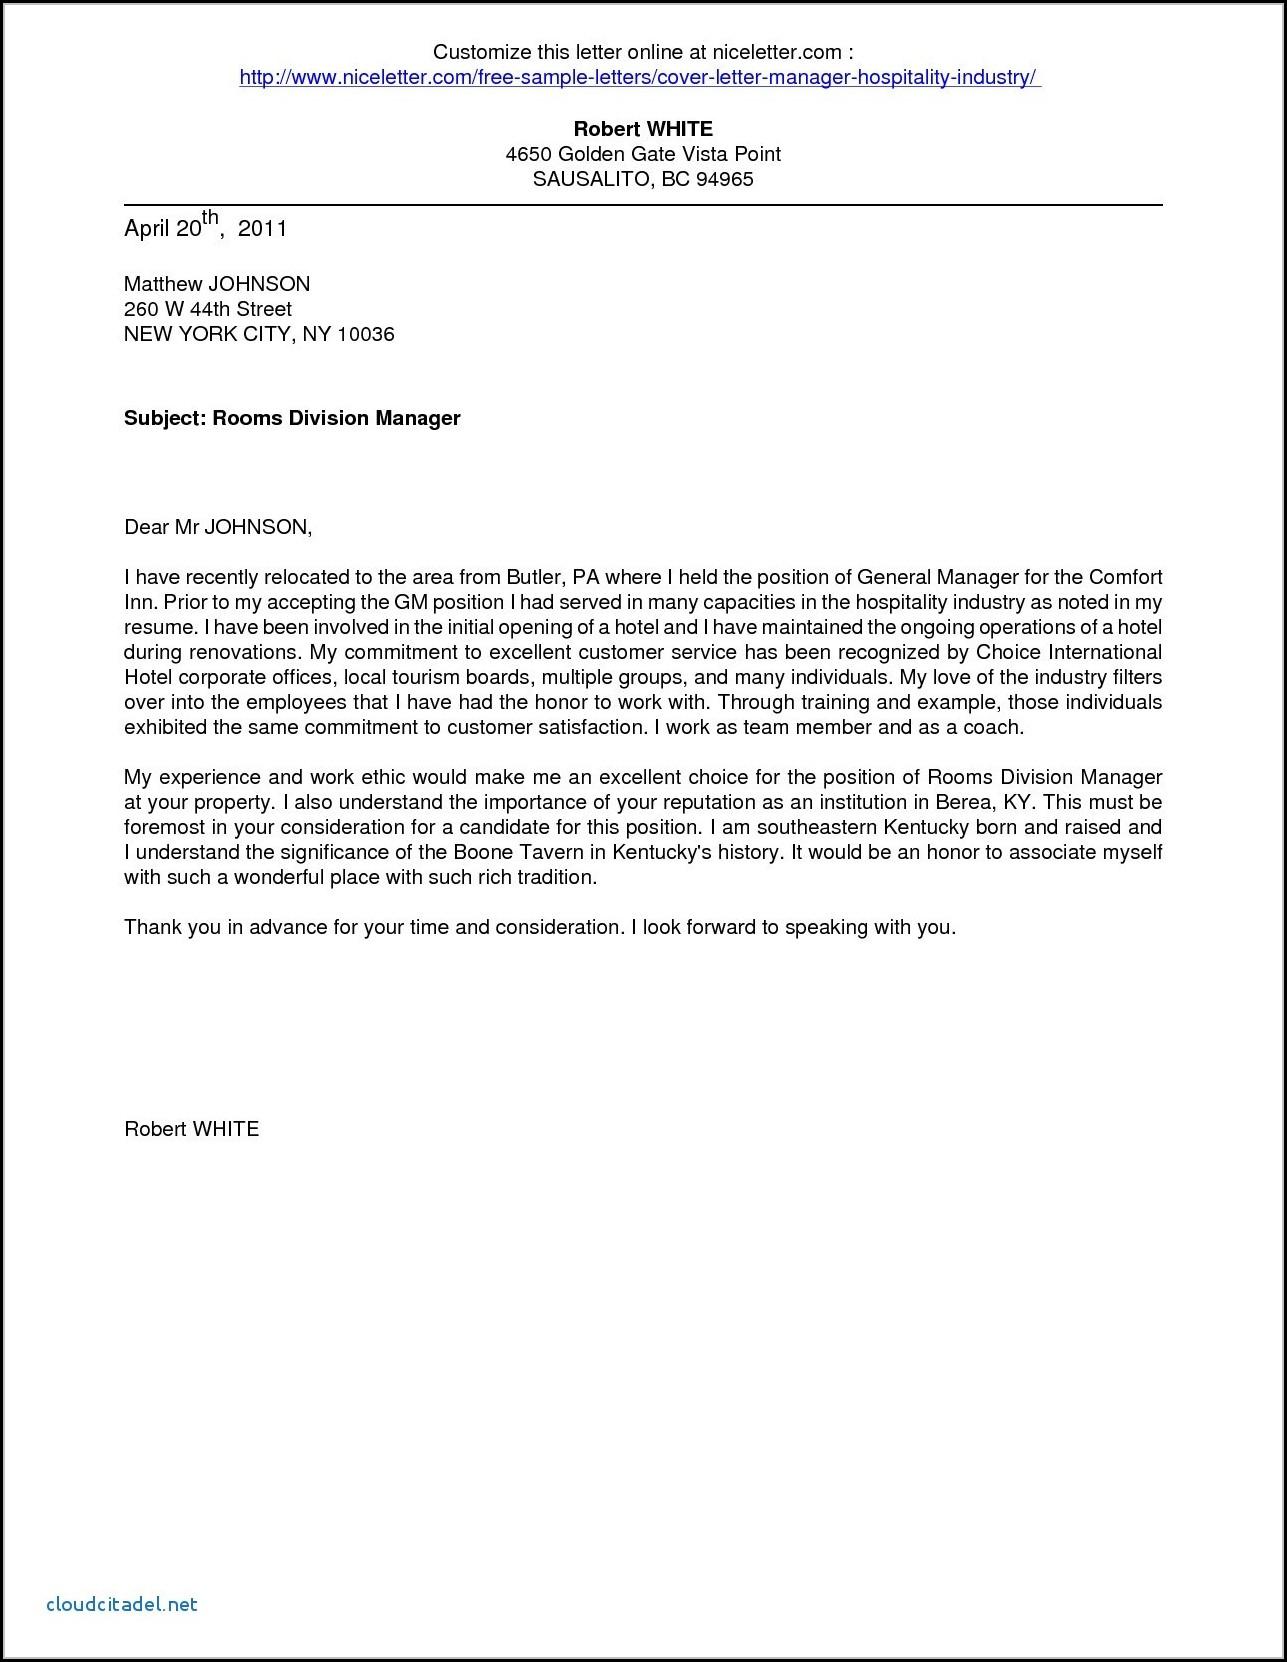 Job Application Letter For Hotel And Restaurant